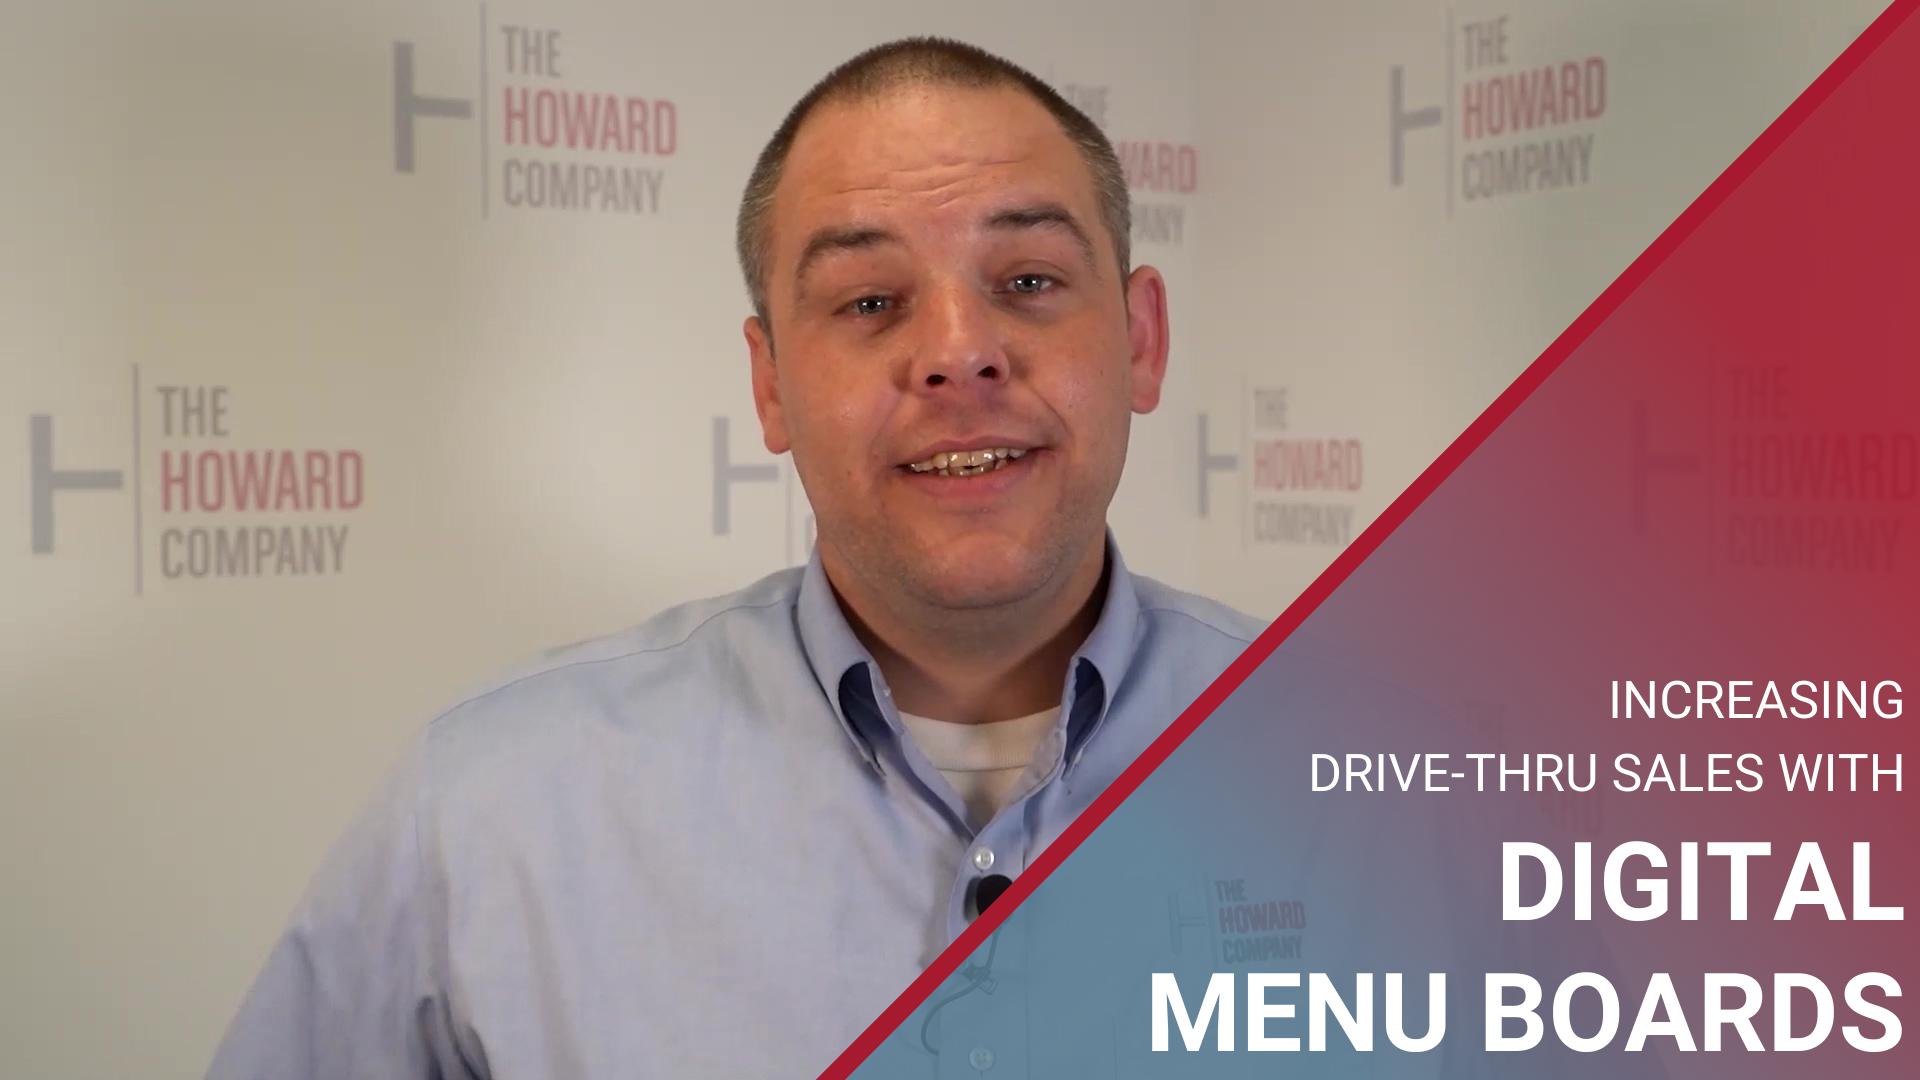 Increasing Drive-Thru Sales with Digital Menu Boards